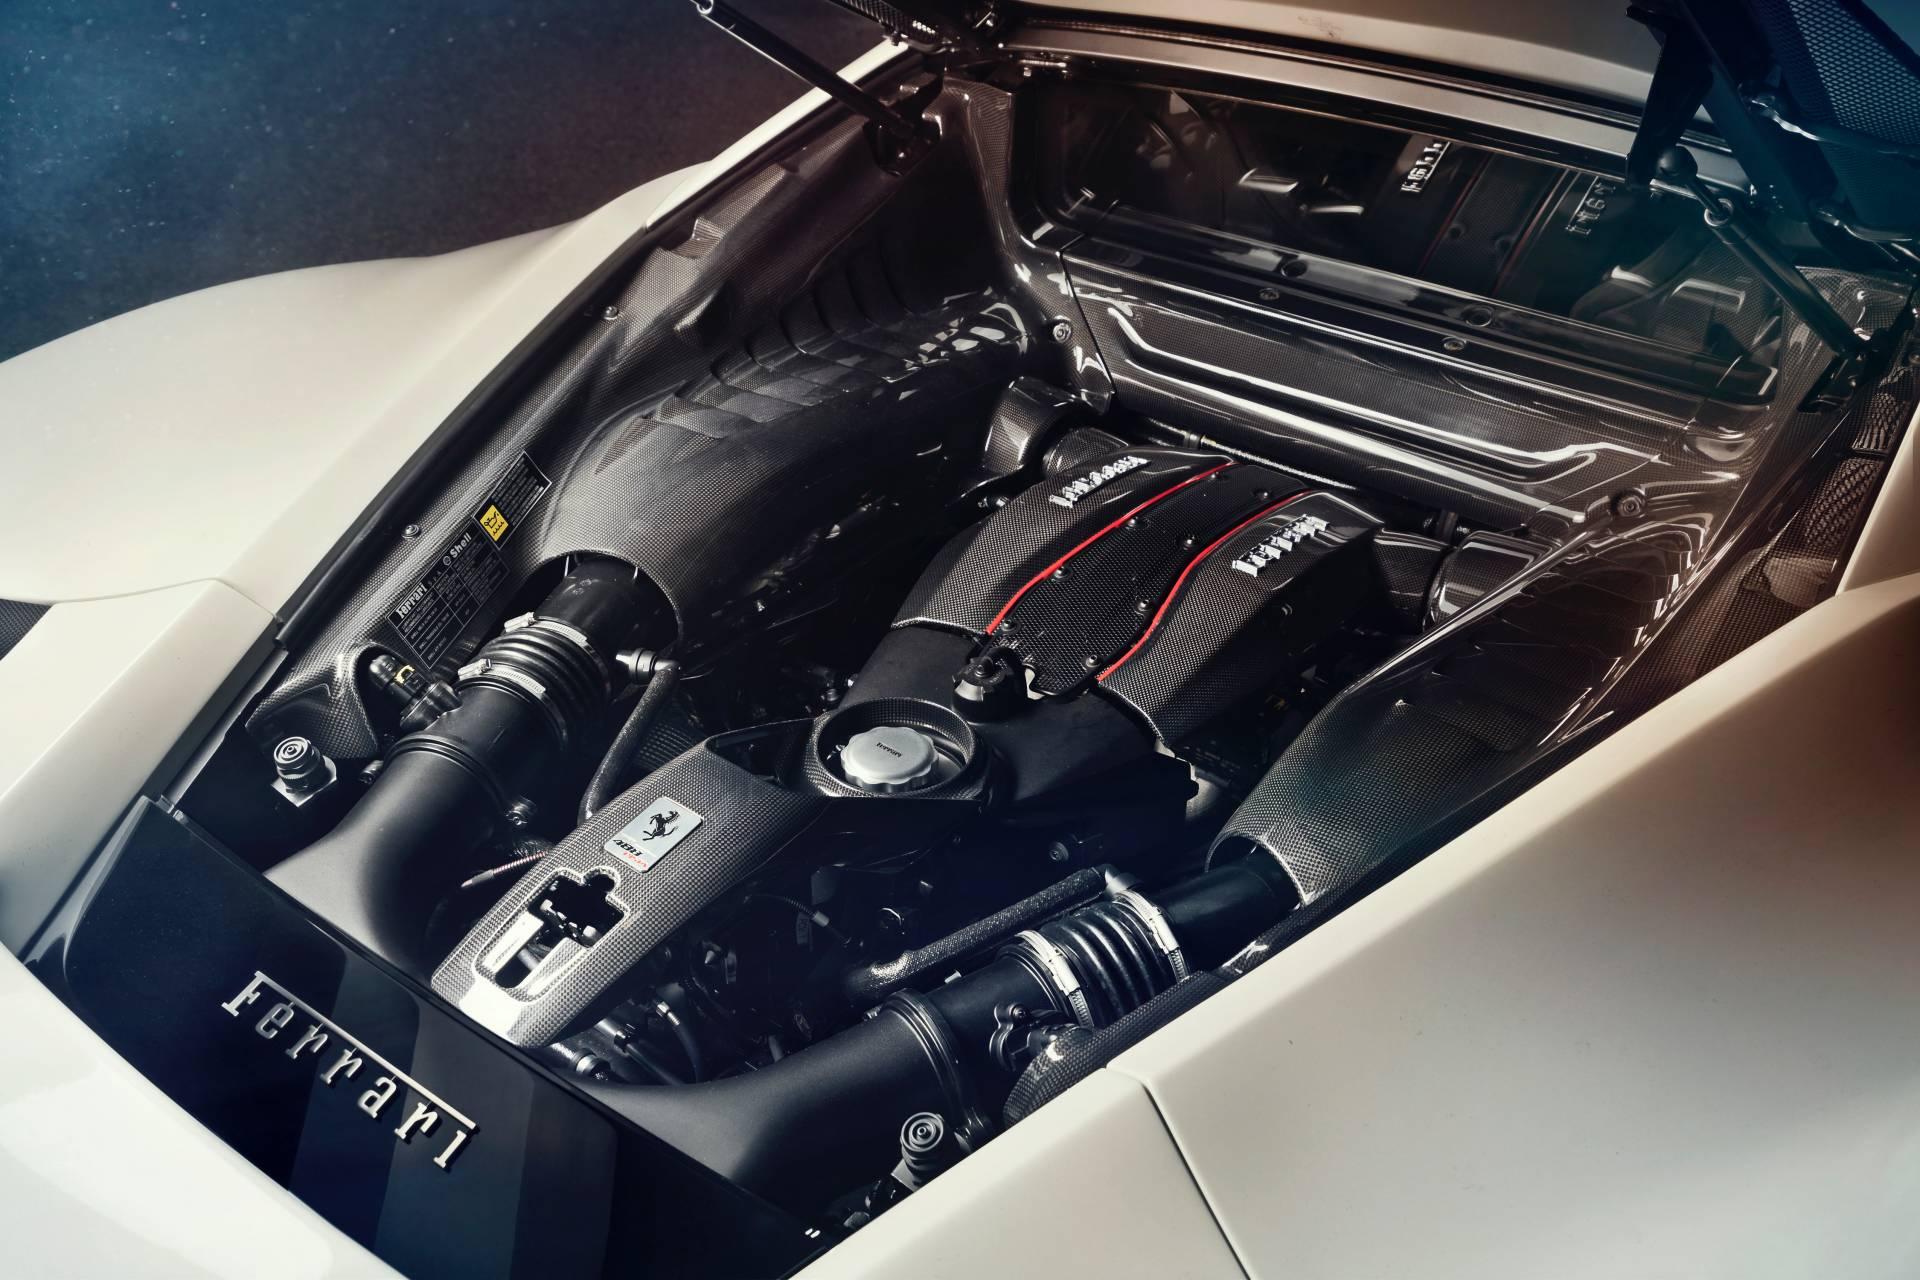 Ferrari-488-Pista-by-Novitec-13